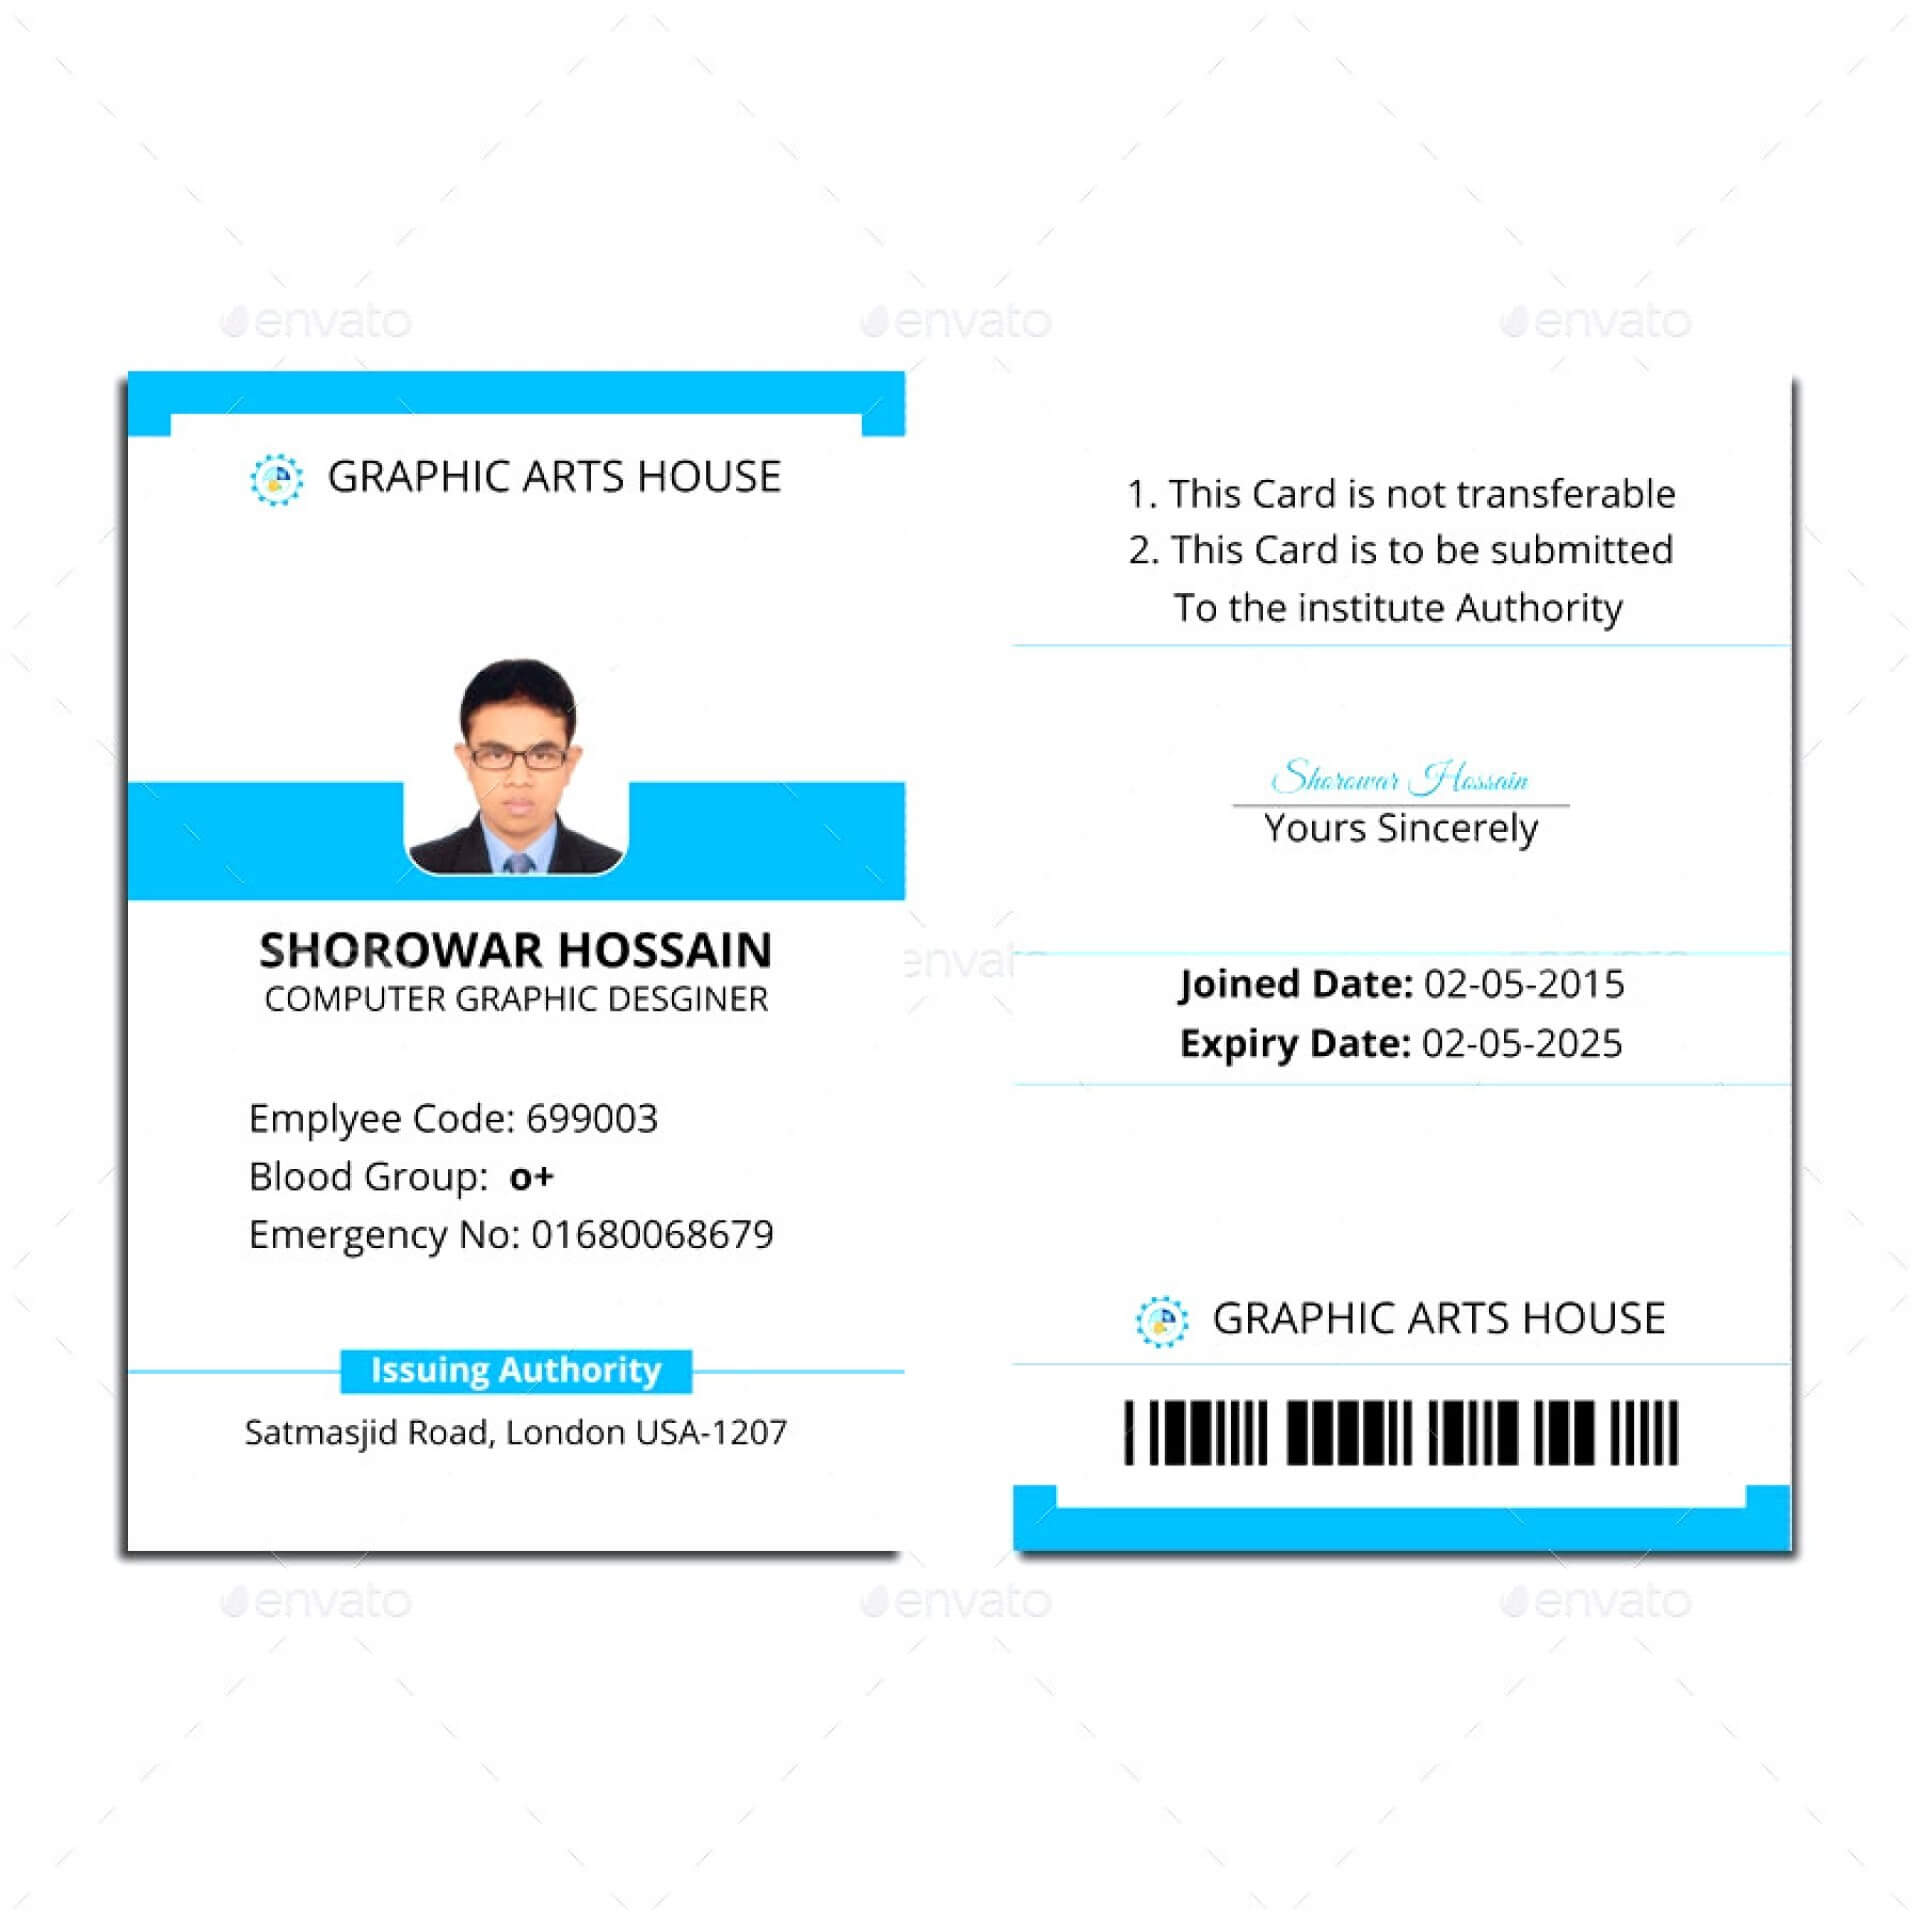 009 Id Badge Template Free Word Card Ideas Unforgettable Pertaining To Id Badge Template Word